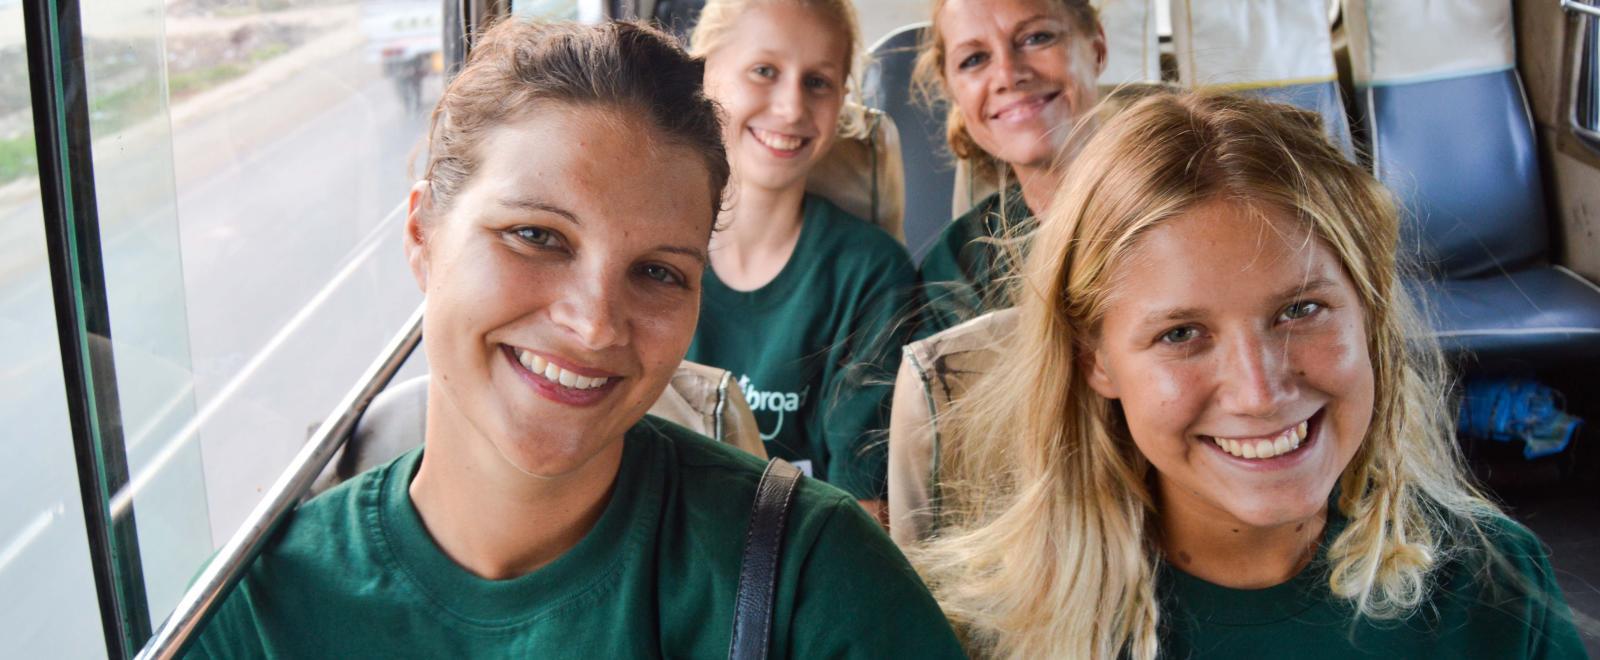 Projects Abroad Freiwillige aus der Schweiz in Tansania